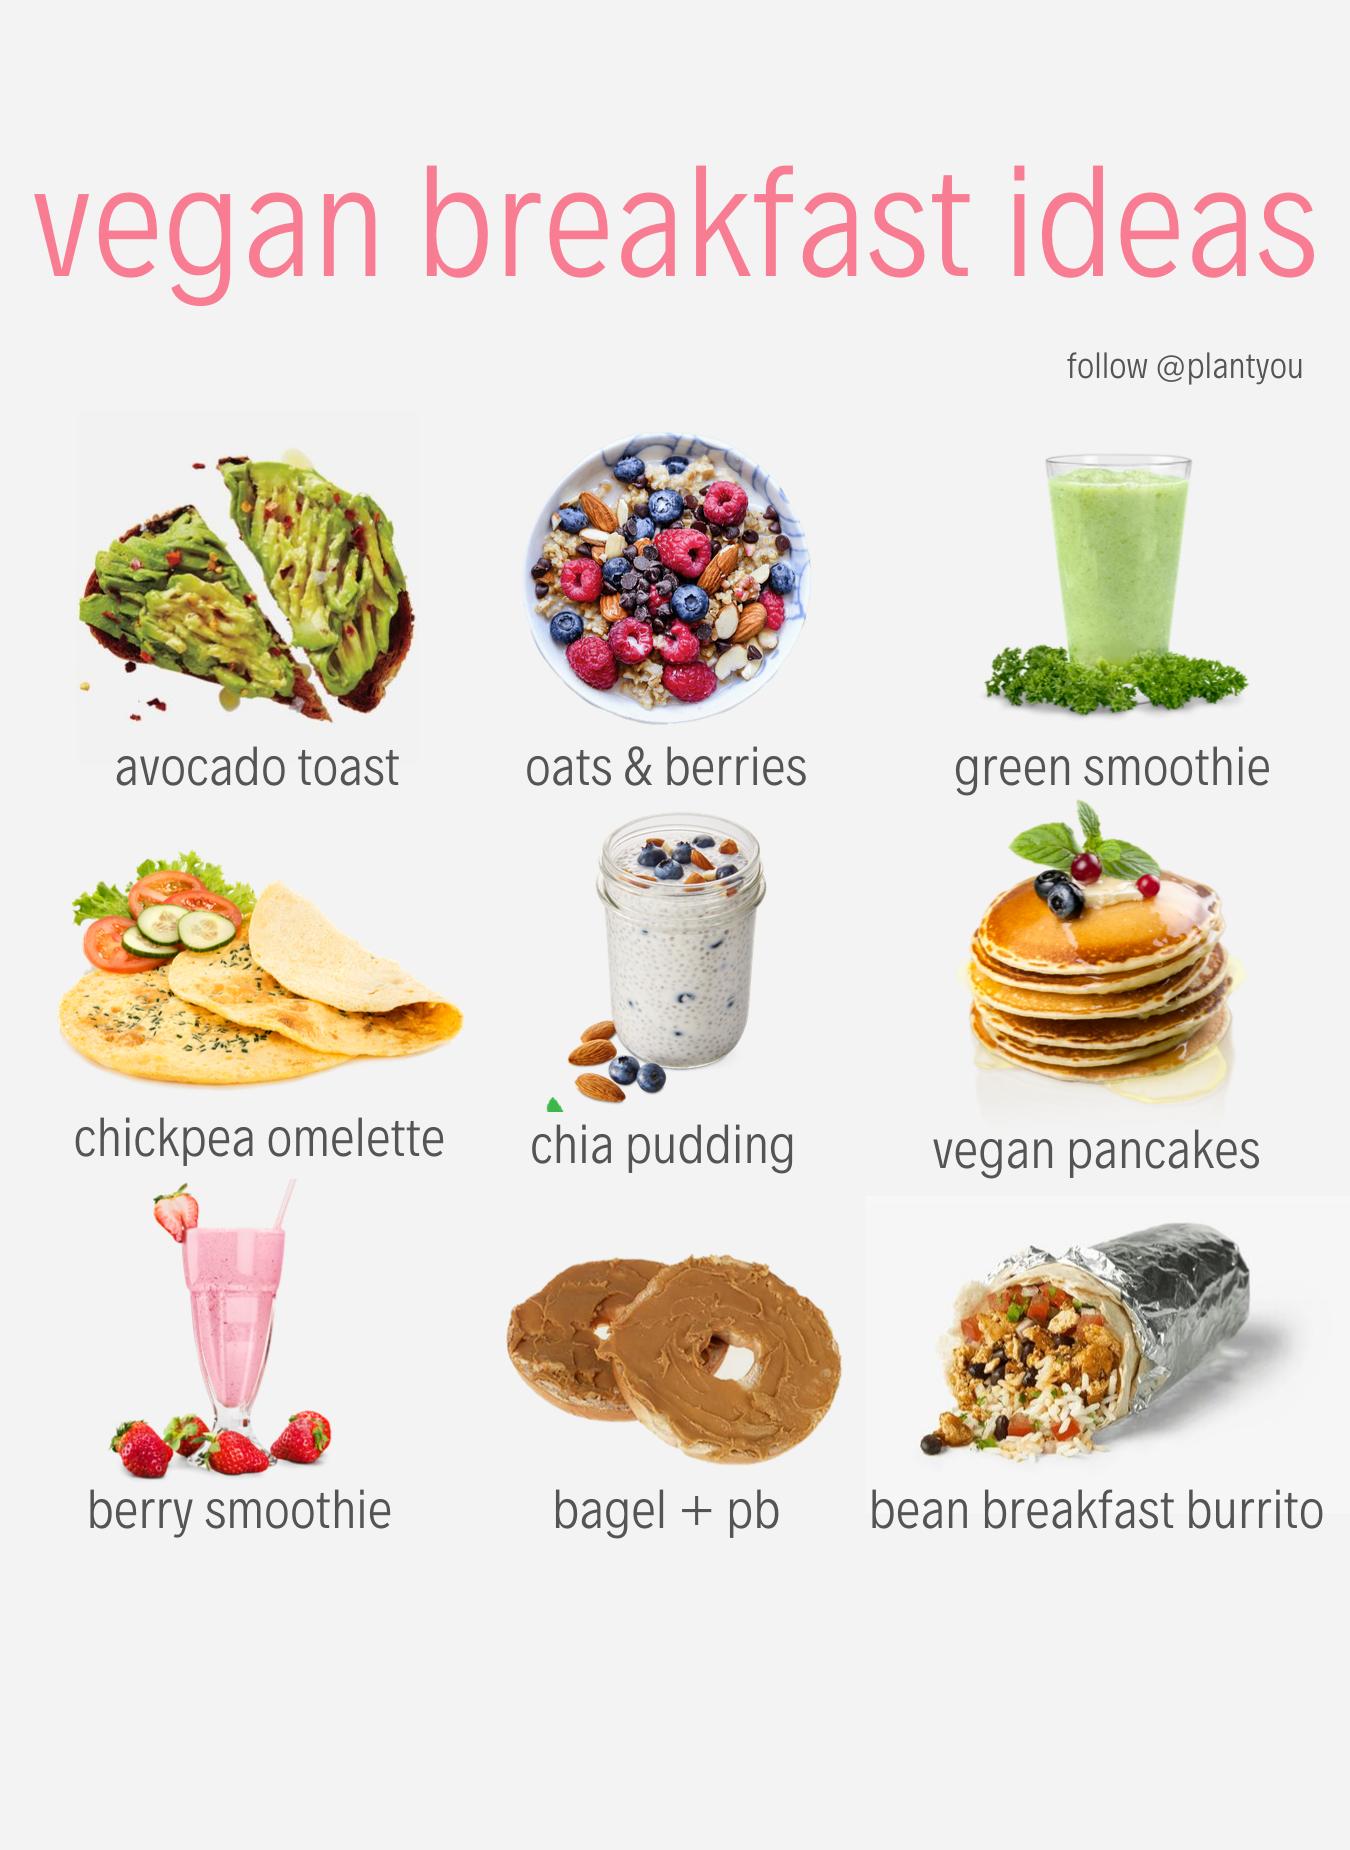 Vegan Breakfast Ideas Easy Plant Based Breakfasts Quick Vegan Breakfast Quick Vegan Breakfast Vegan Recipes Plant Based Vegan Meal Plans